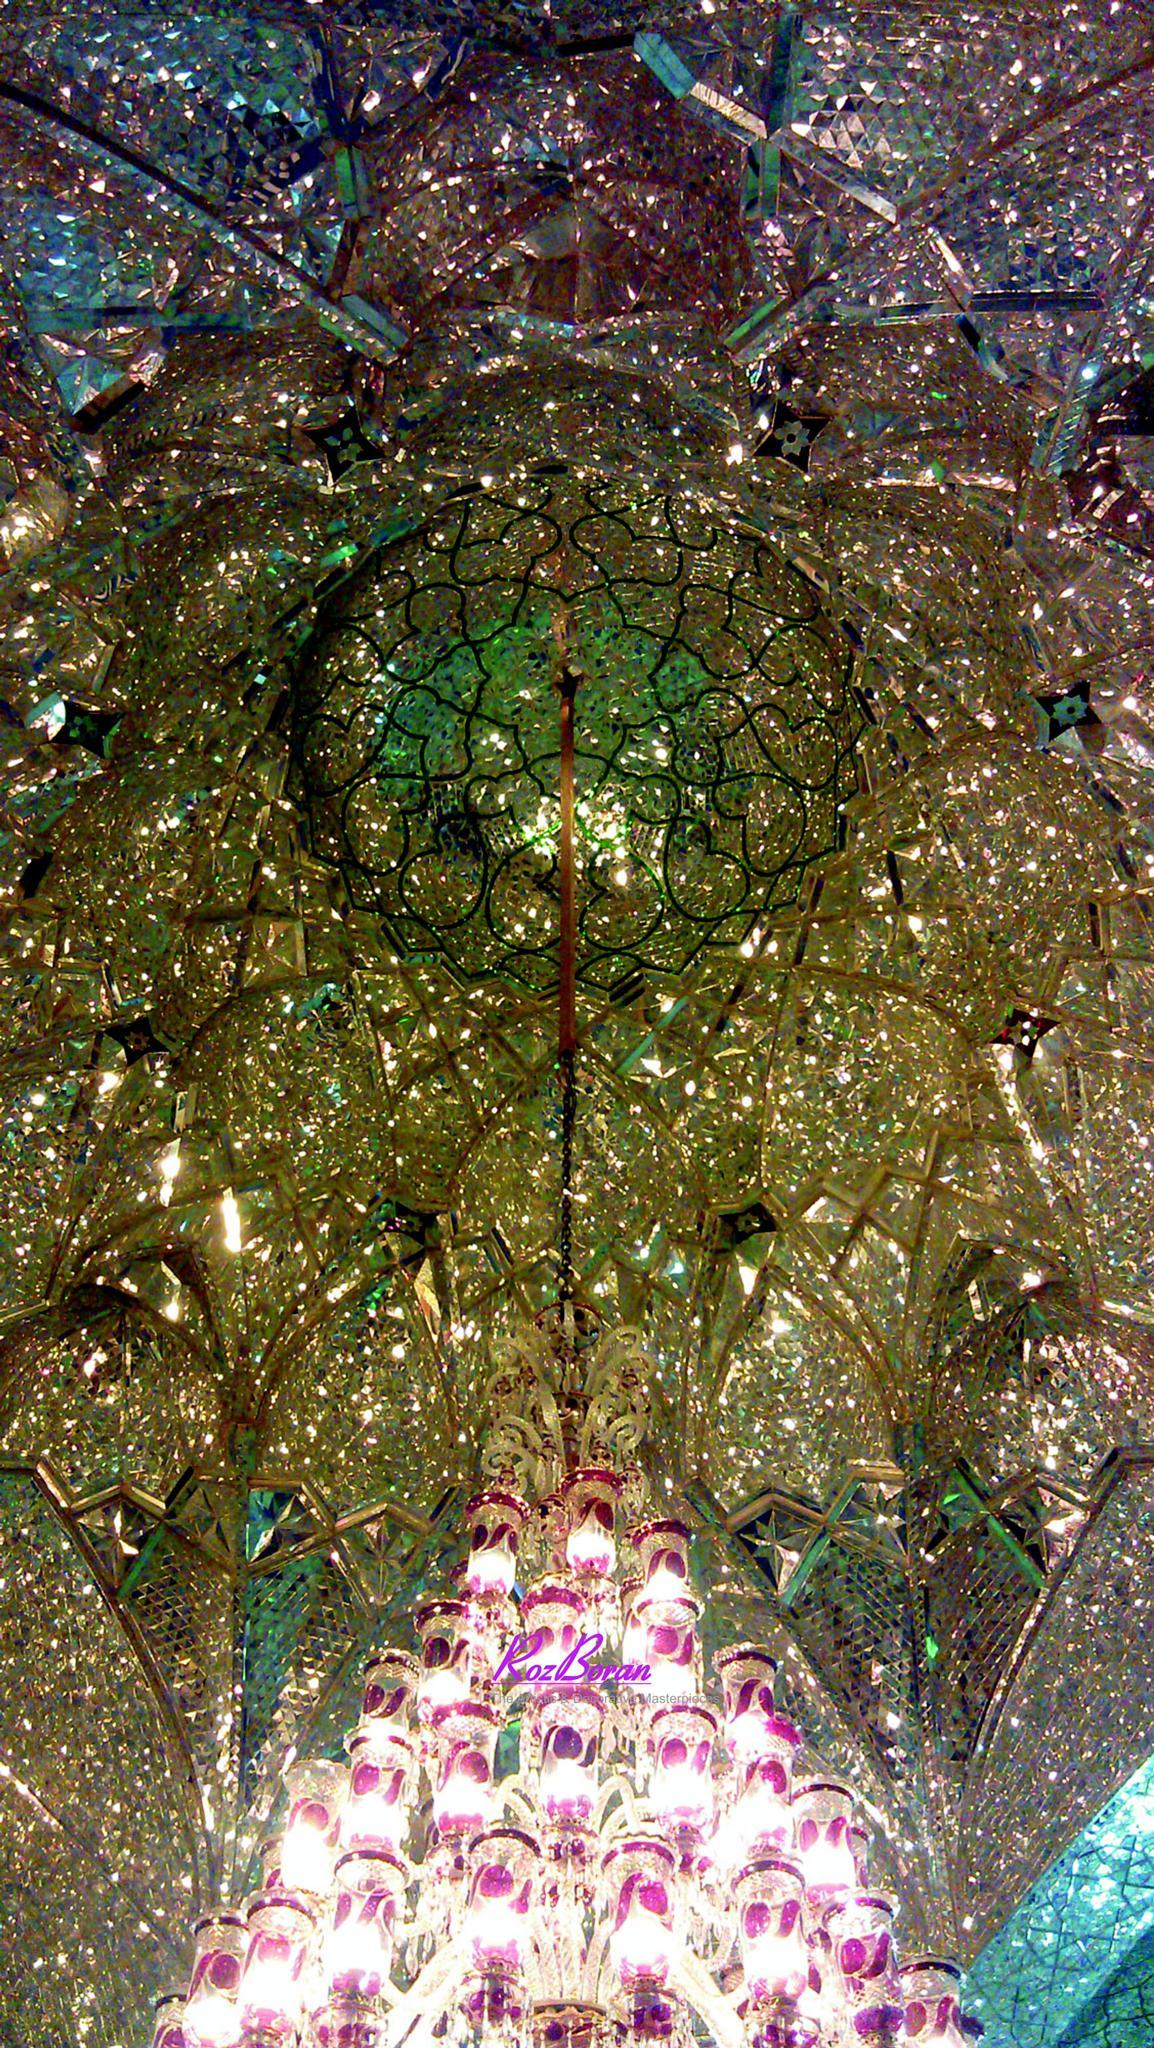 The Art of Glass & Mirrors by R O Z B O R A N